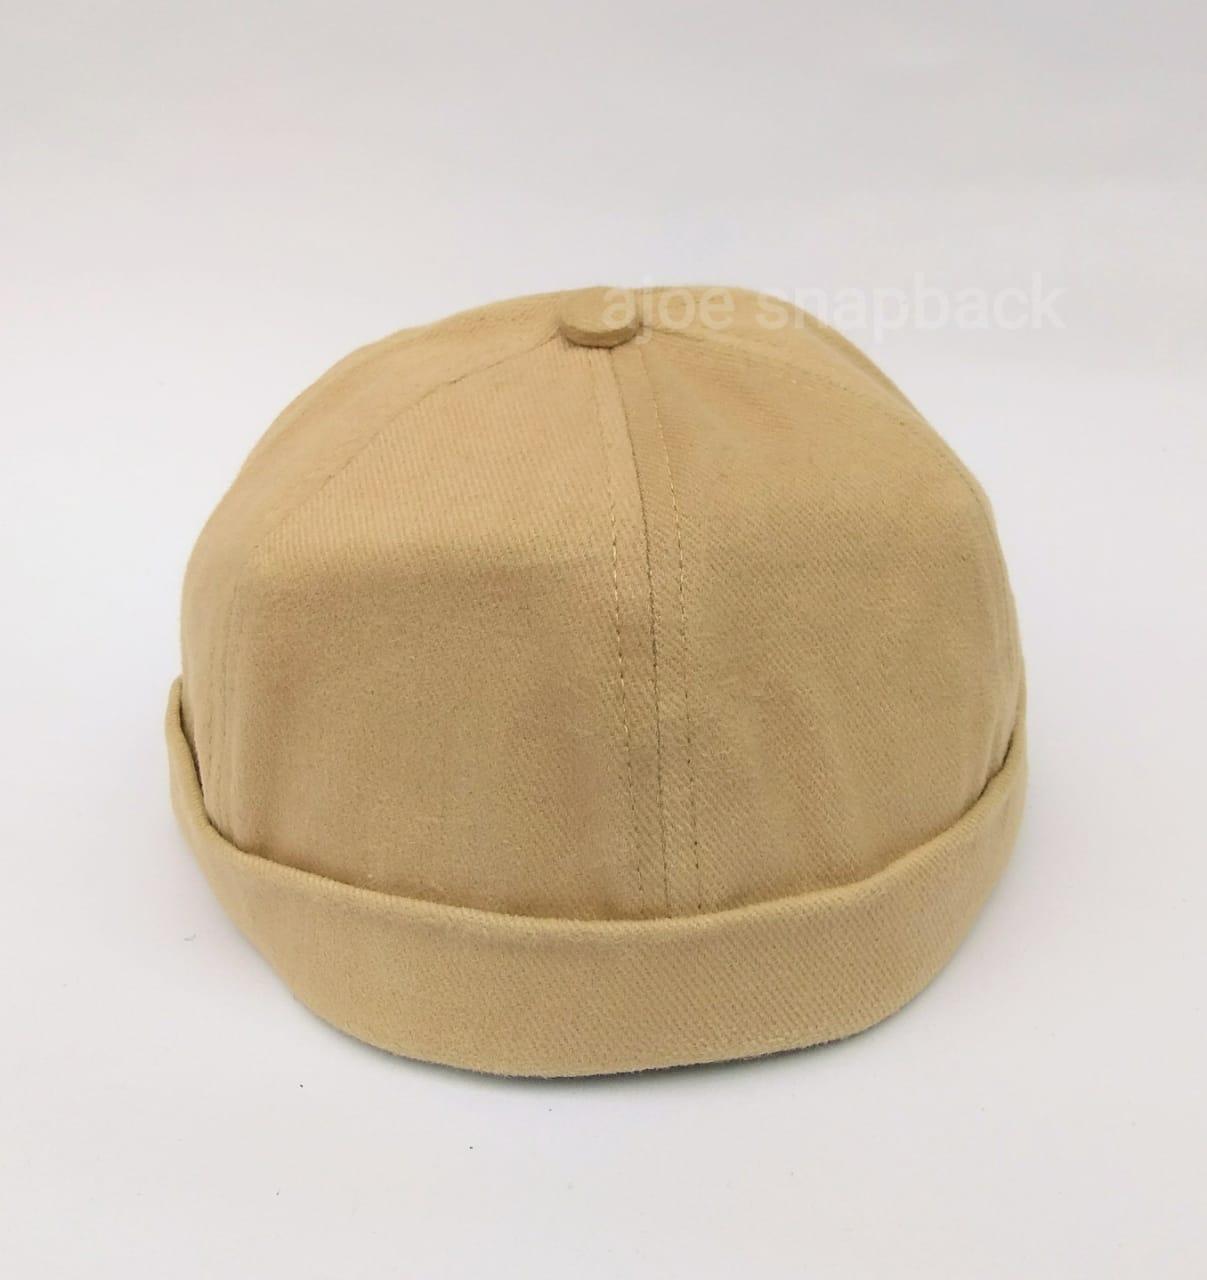 Sz Graphics Hi Haters Topi Pria Hat Fashion Kalibre Newsboy Flat Cap Biru Navy Abu 991186 999 Muslim Kopiah Peci Meckey